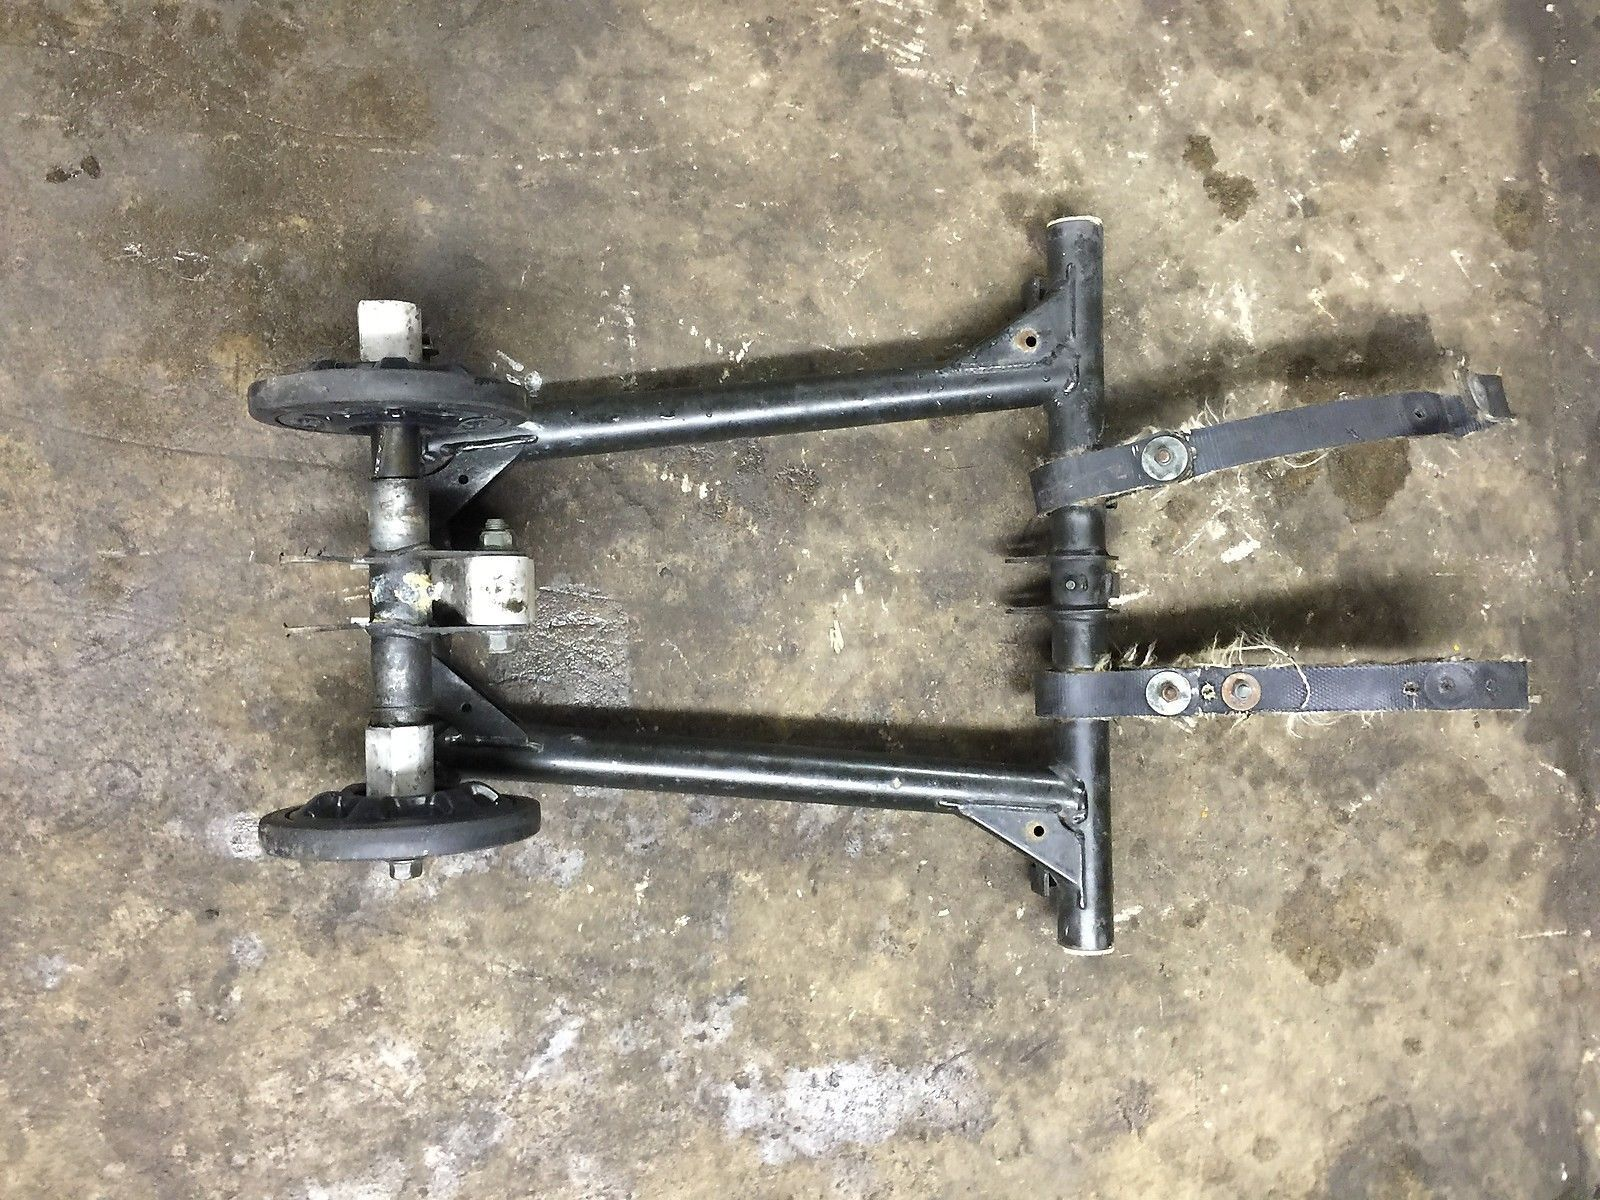 Yamaha apex attak rage nytro vector rx1 06 07 08 09 10 GT RTX pivot arm torque